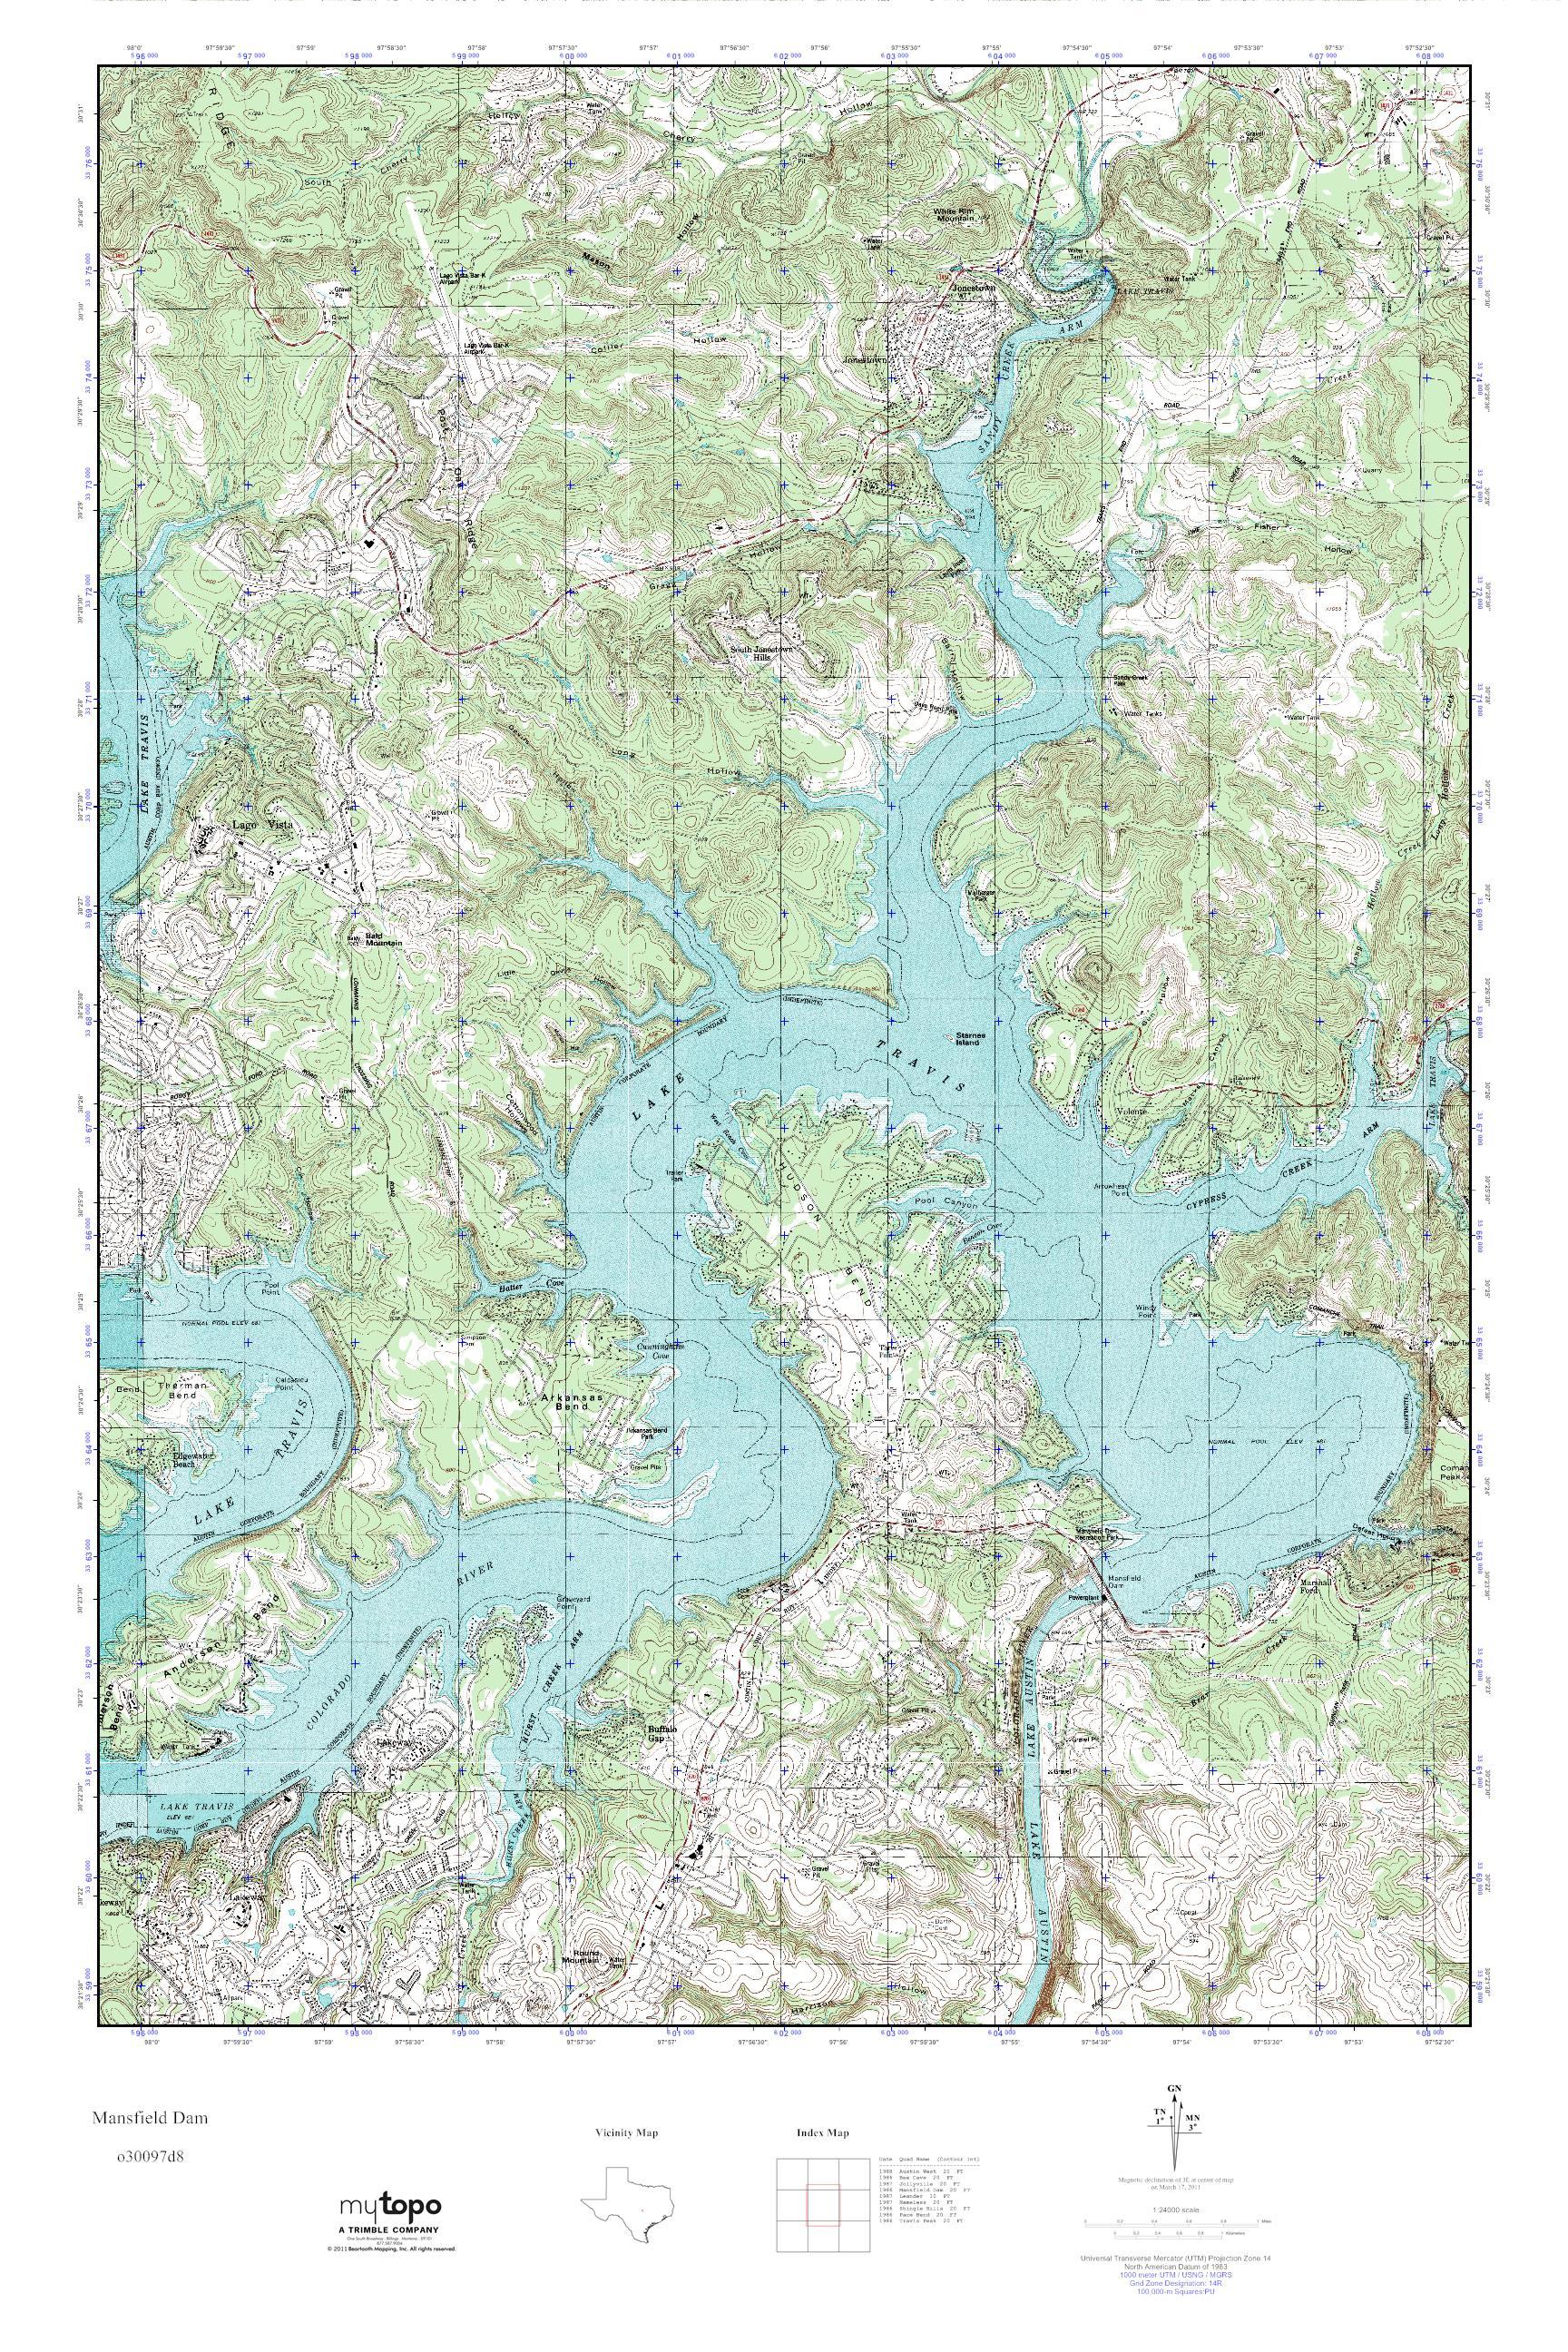 Mytopo Mansfield Dam, Texas Usgs Quad Topo Map - Mansfield Texas Map